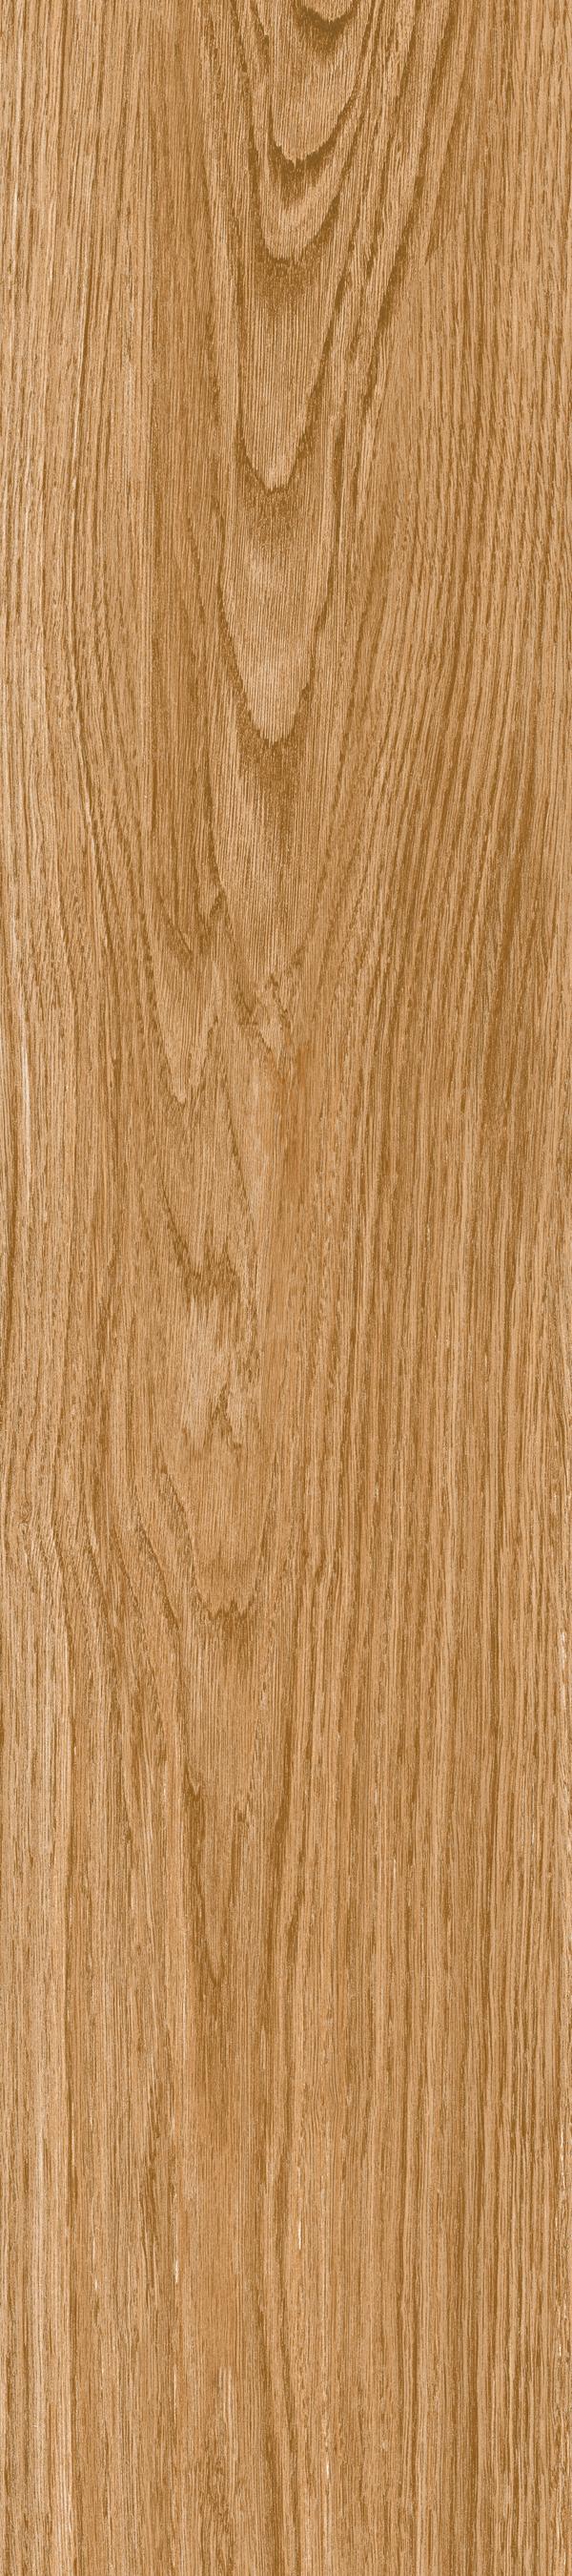 Madera Habitat Porcelanico Madera 19 3x89 3cm Mate Deserto Wood Texture Wood Wood Surface